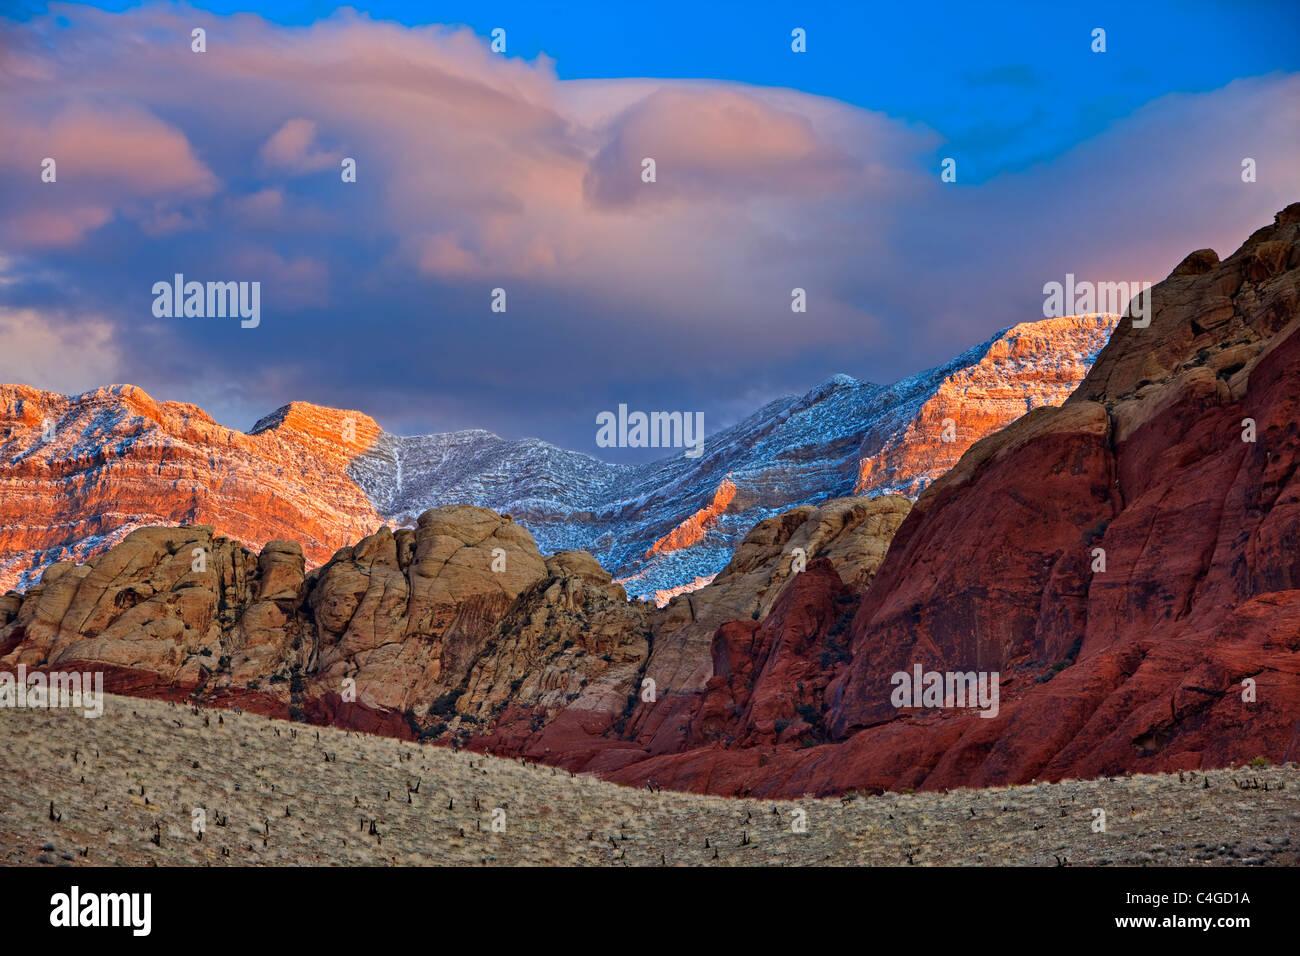 Spring Mountains, Red Rock Canyon National Conservation Area, Neuschnee auf Spring Mountains bei Sonnenaufgang im Stockbild